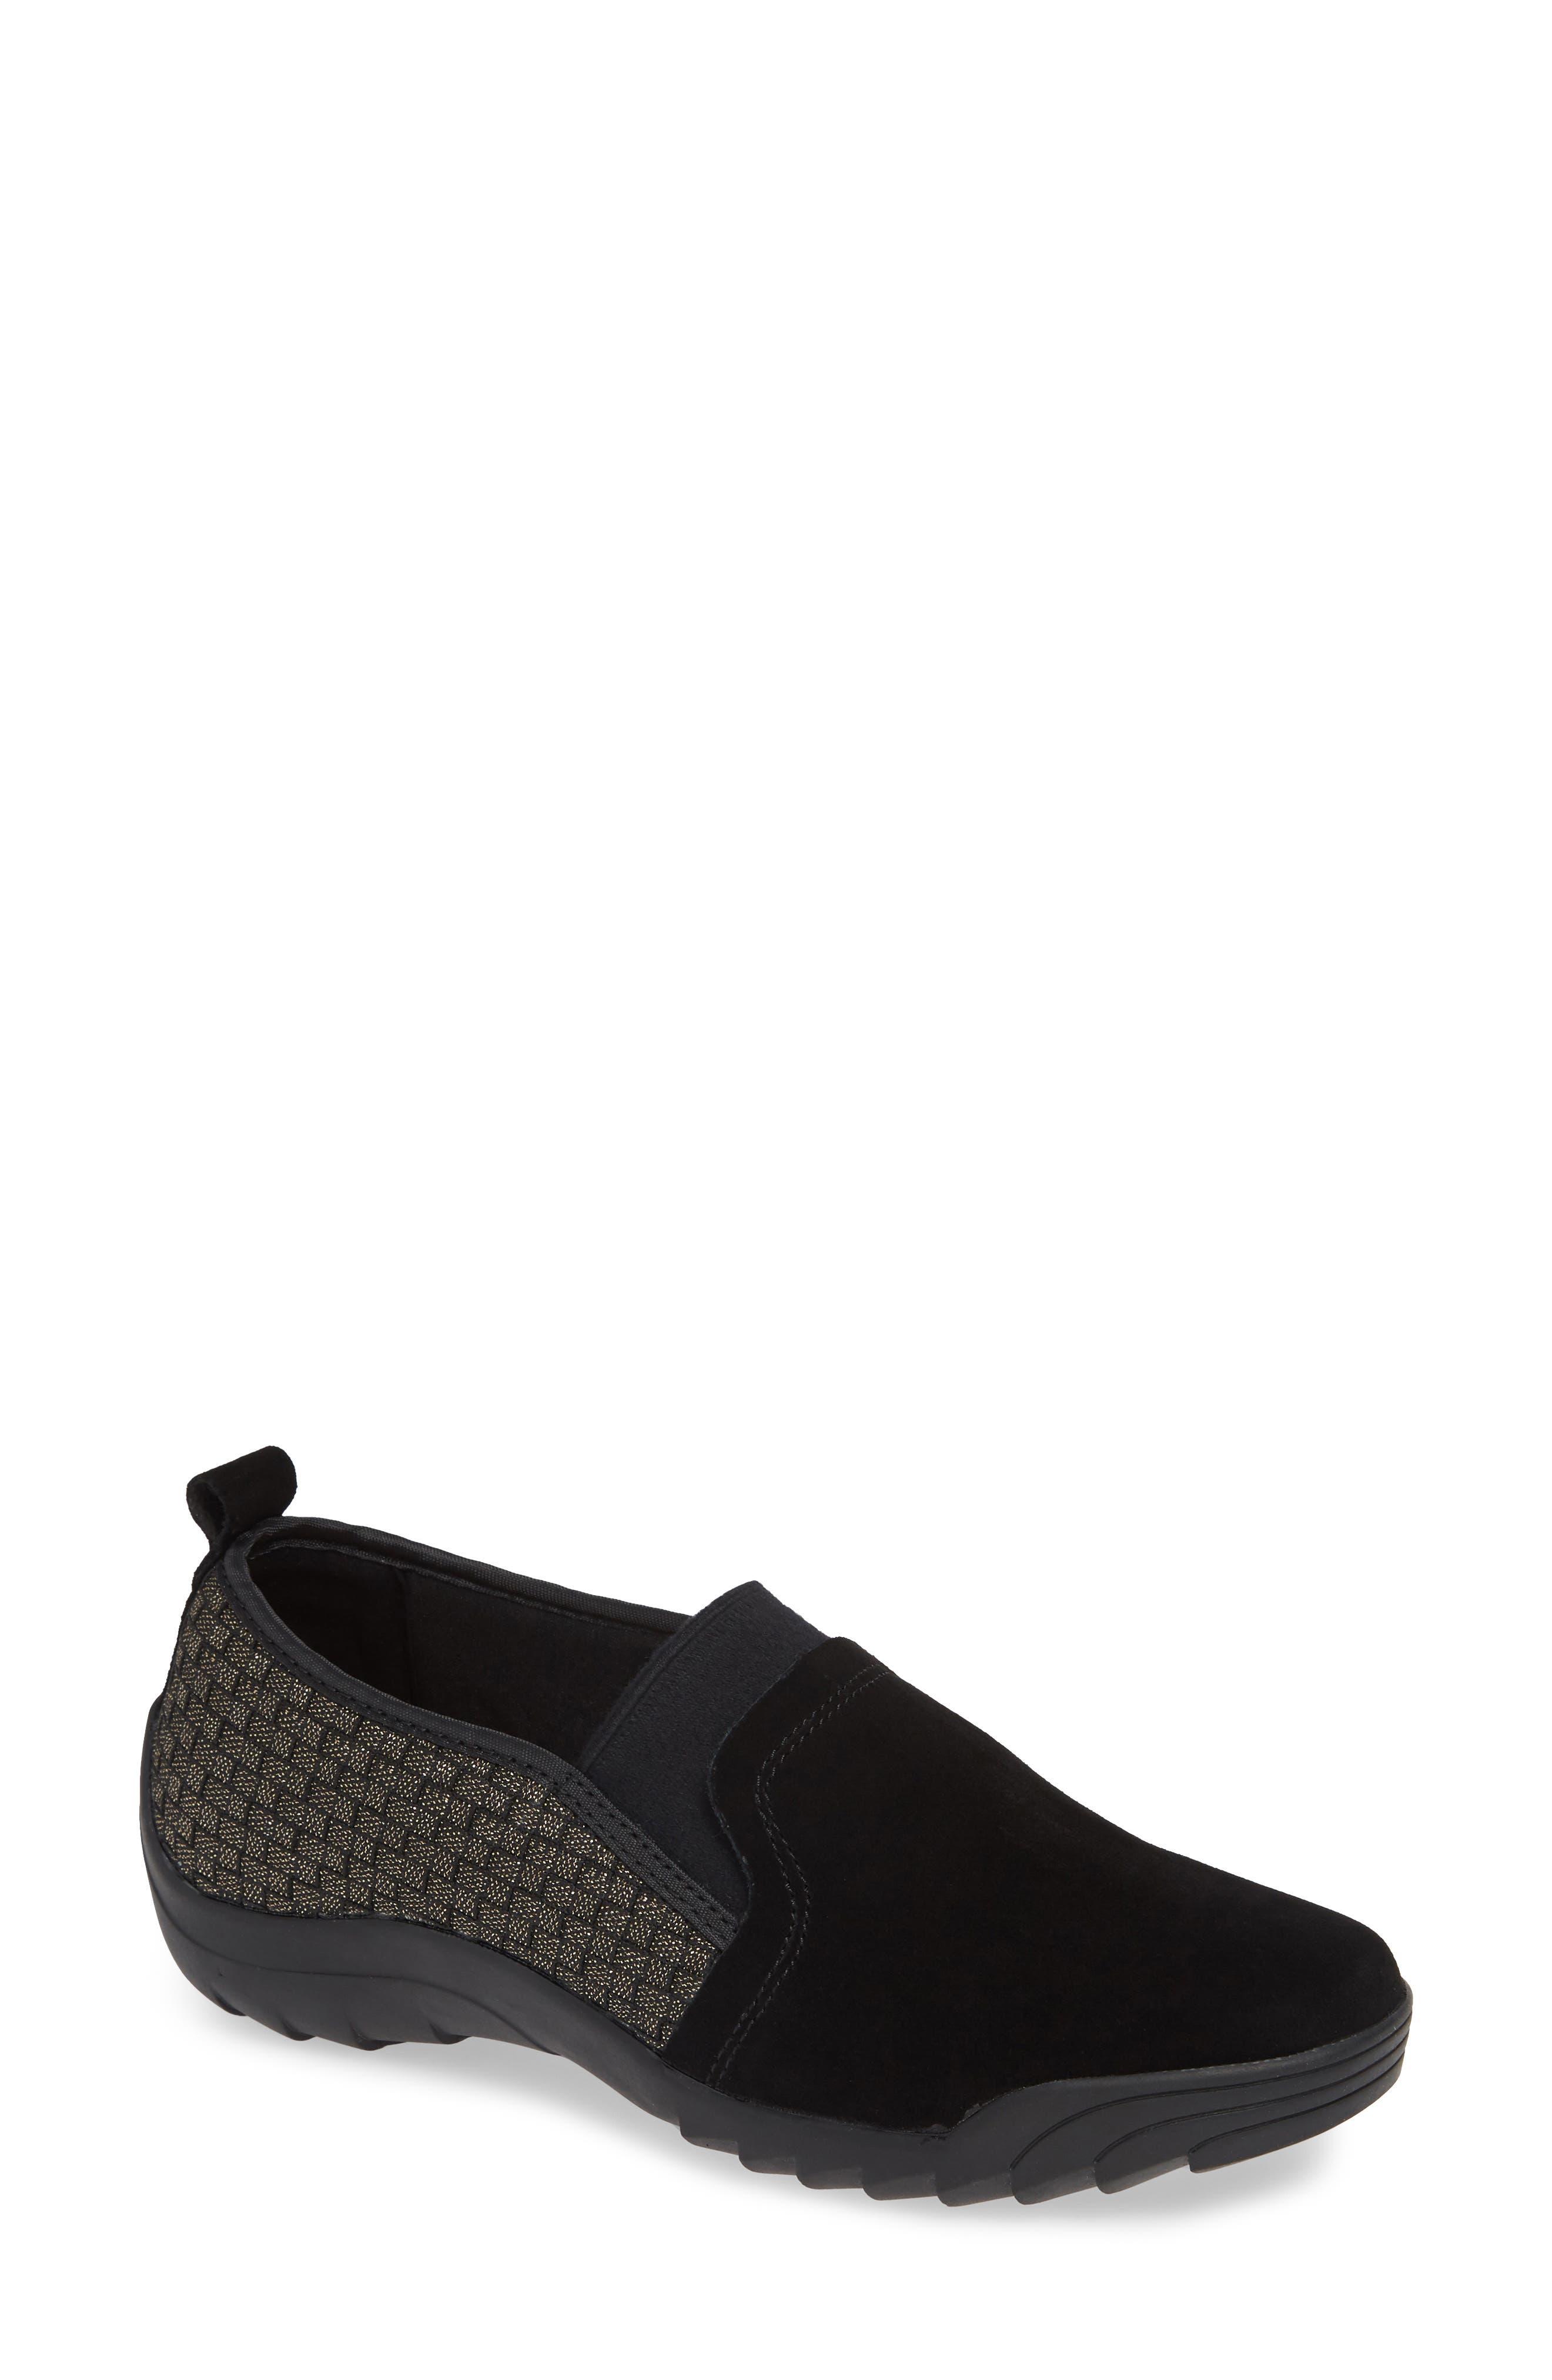 Swift Slip-On Sneaker,                         Main,                         color, Gold Black Shimmer Leather